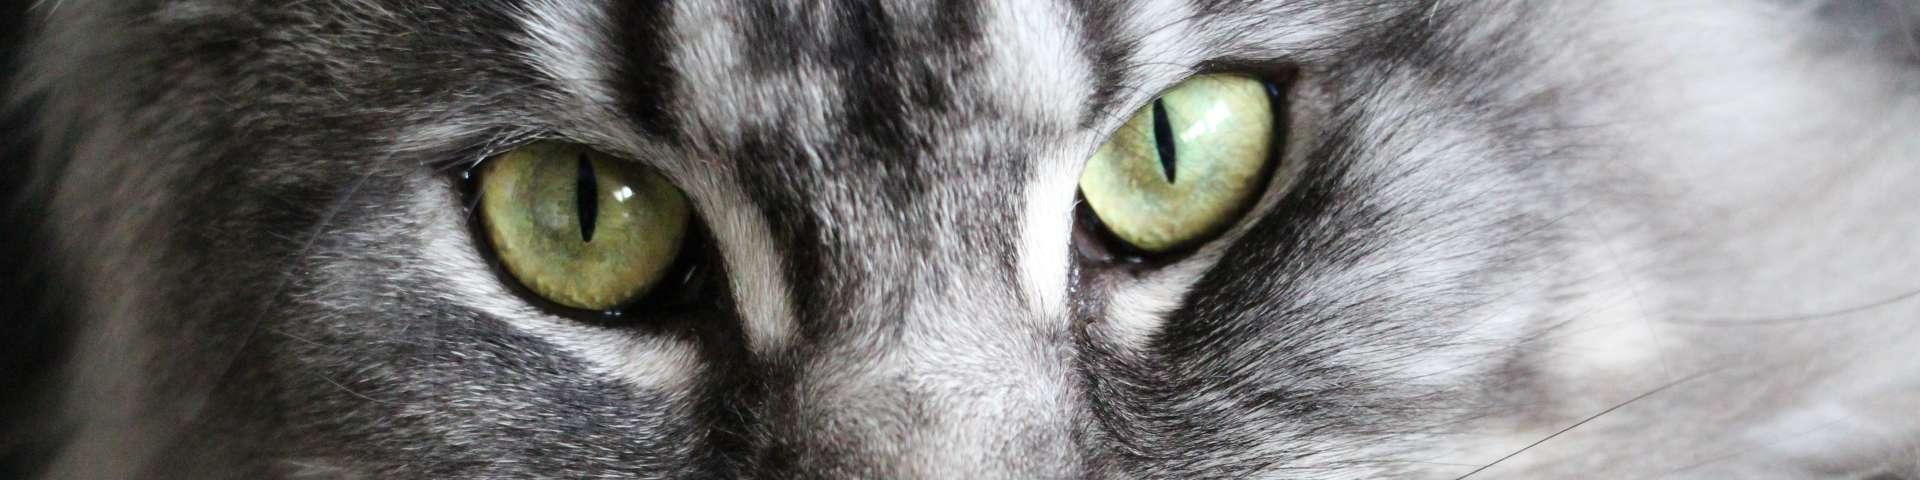 Grootste kattenrassen